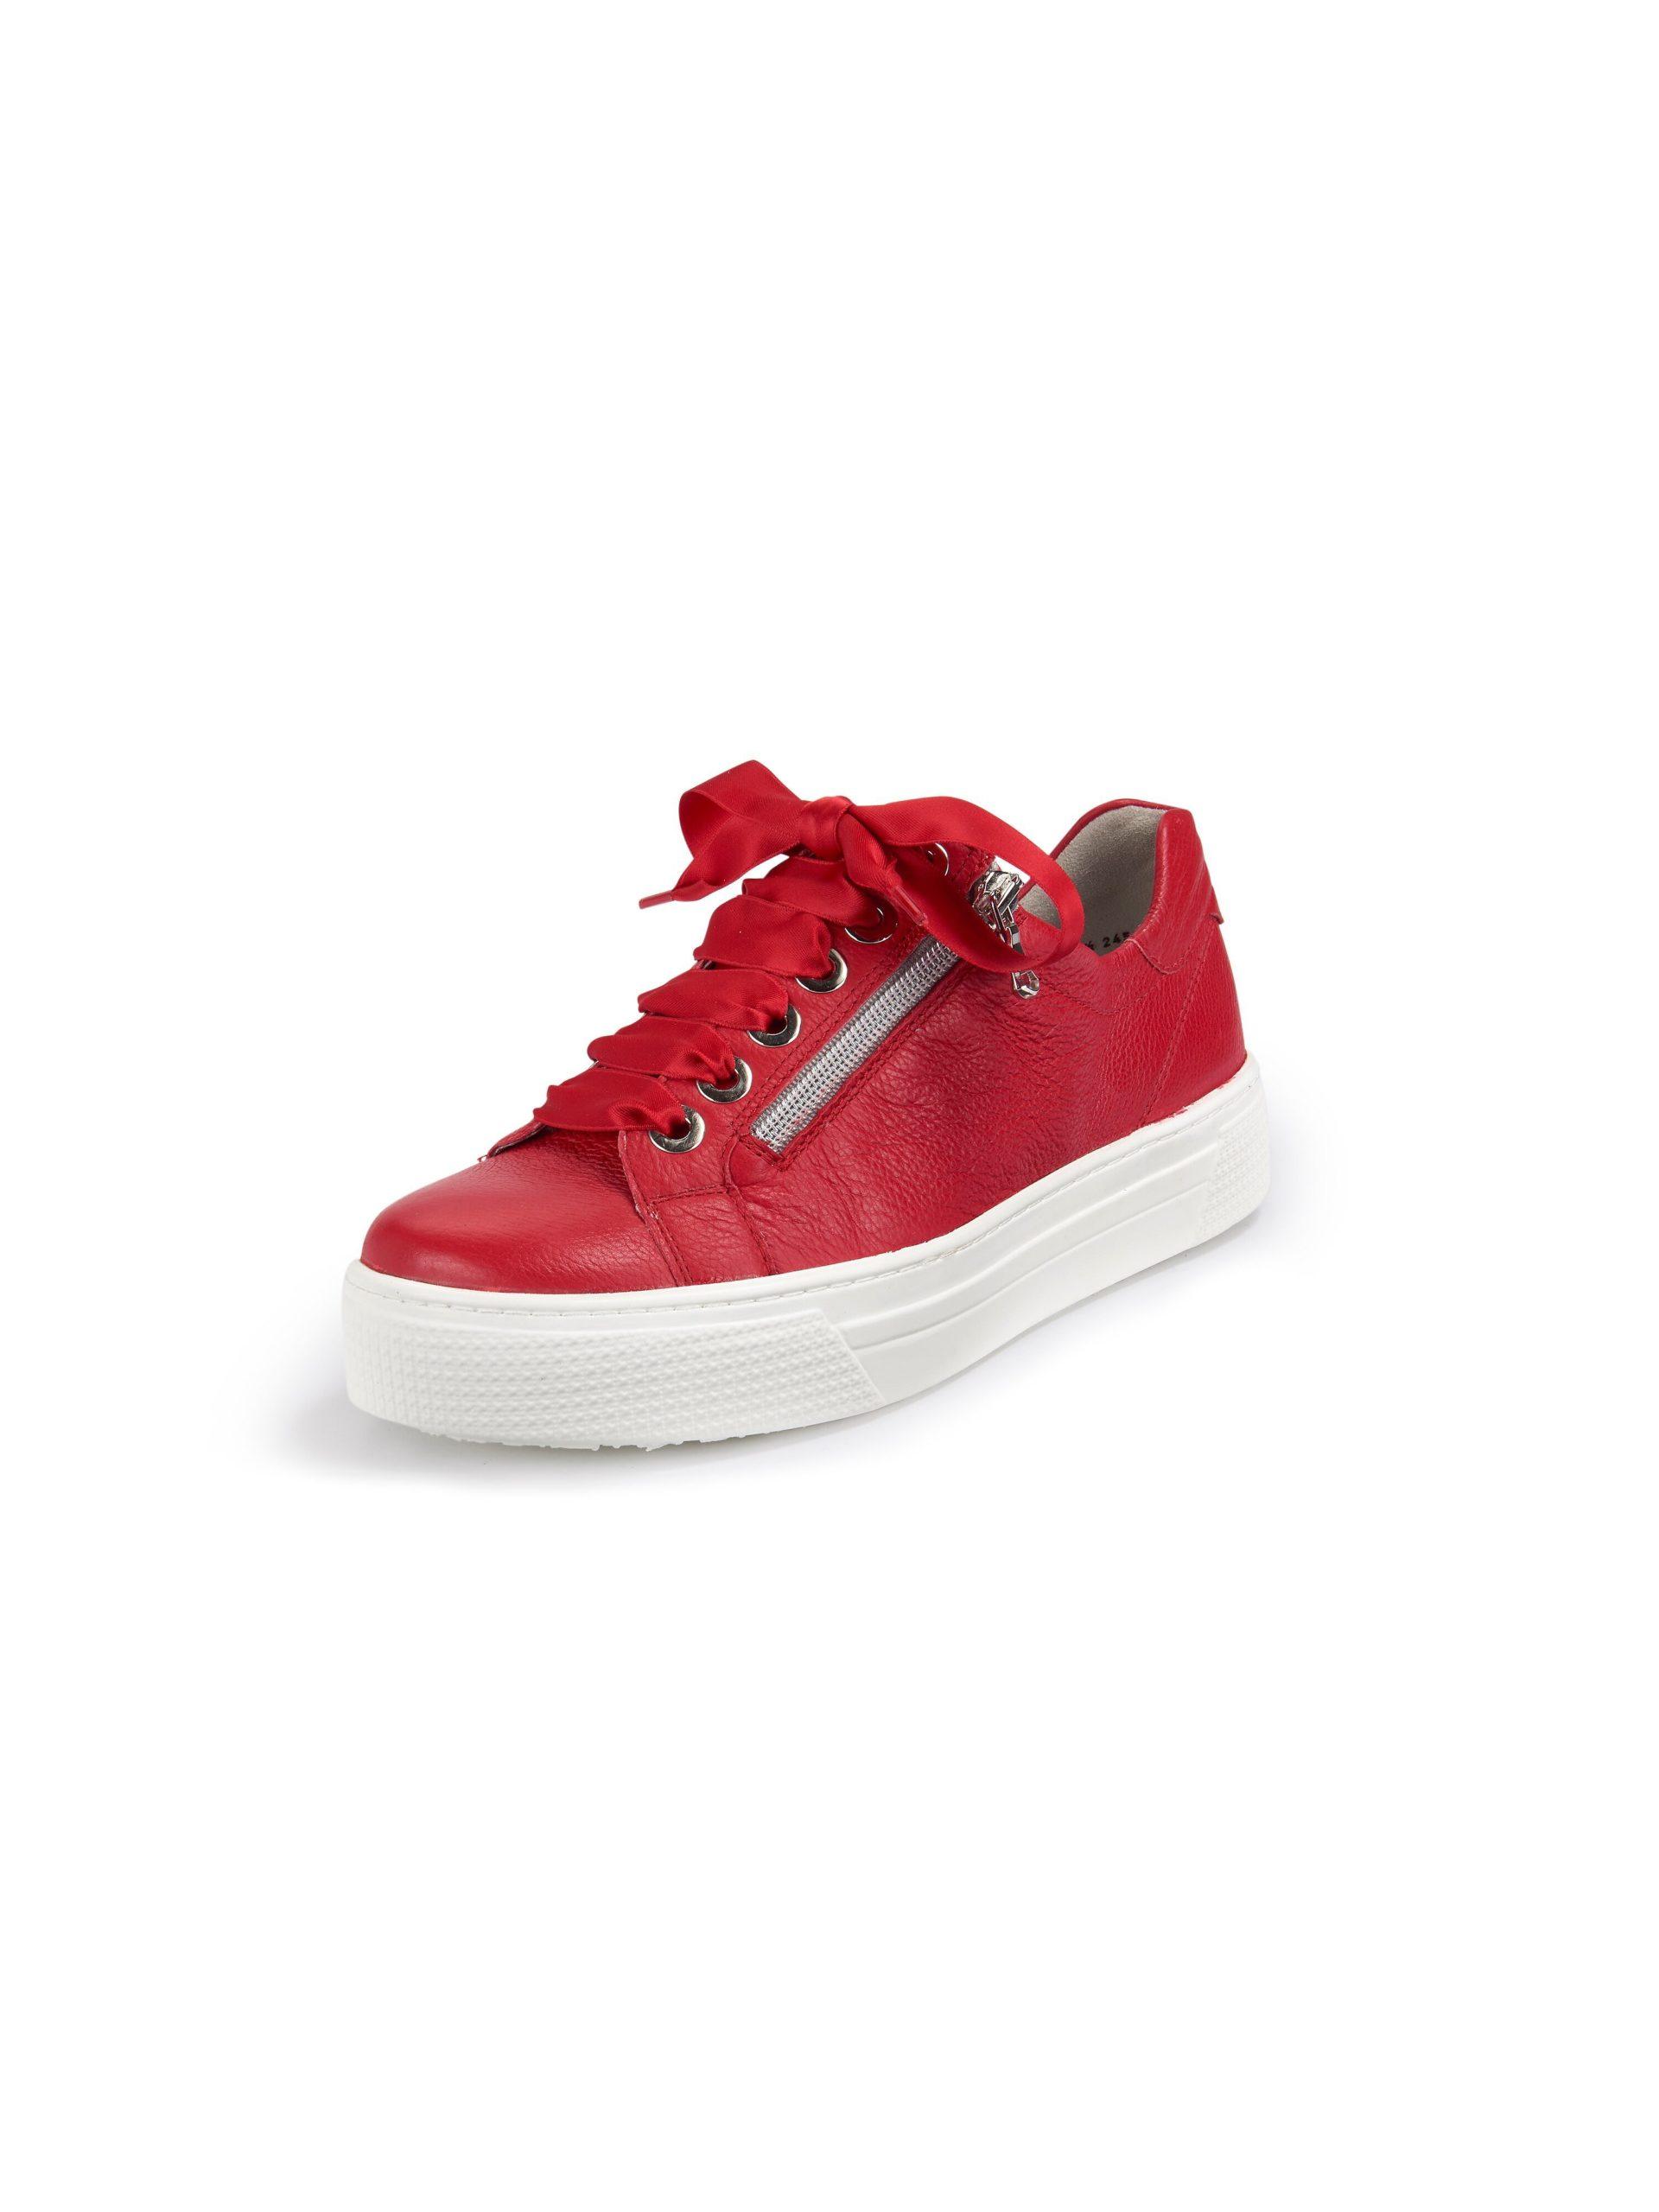 Sneakers model Ingrid Van Semler rood Kopen